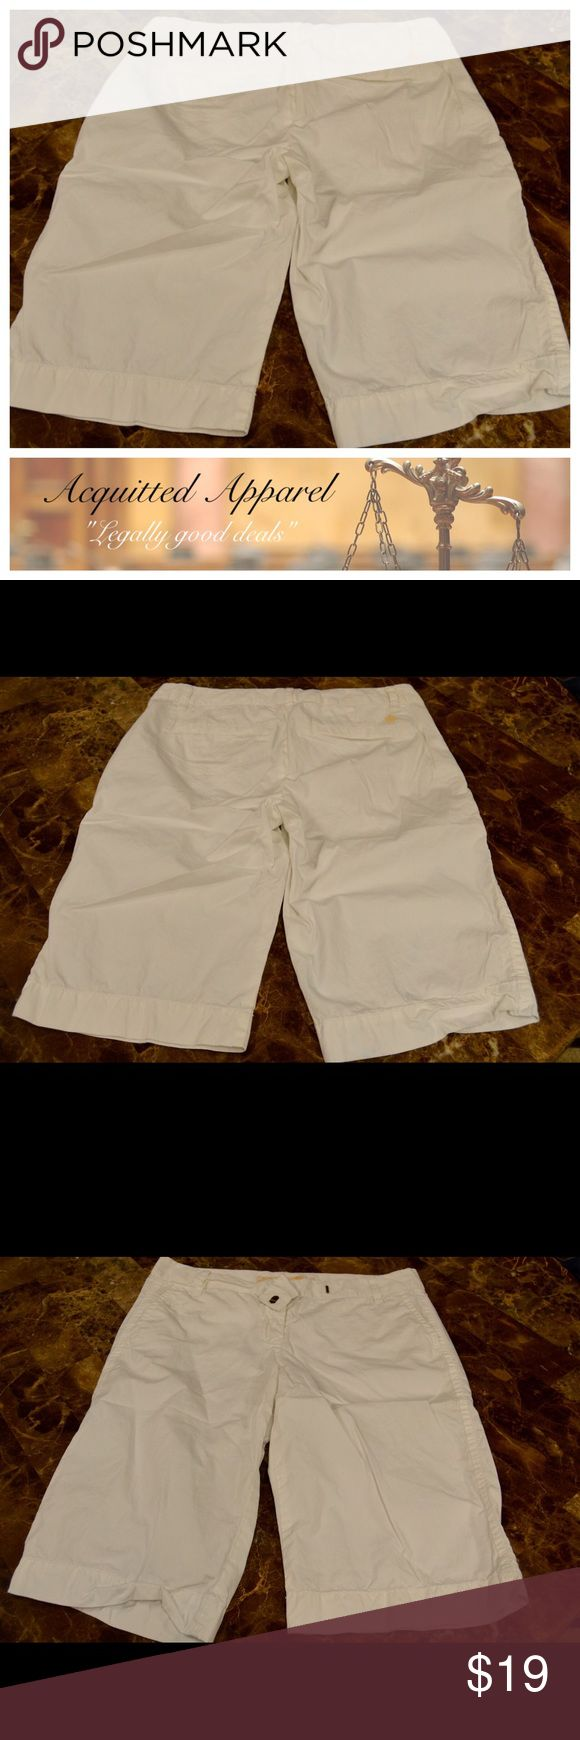 J Crew Chino Broken In Bermuda Shorts Size 4. White. Excellent condition. J. Crew Shorts